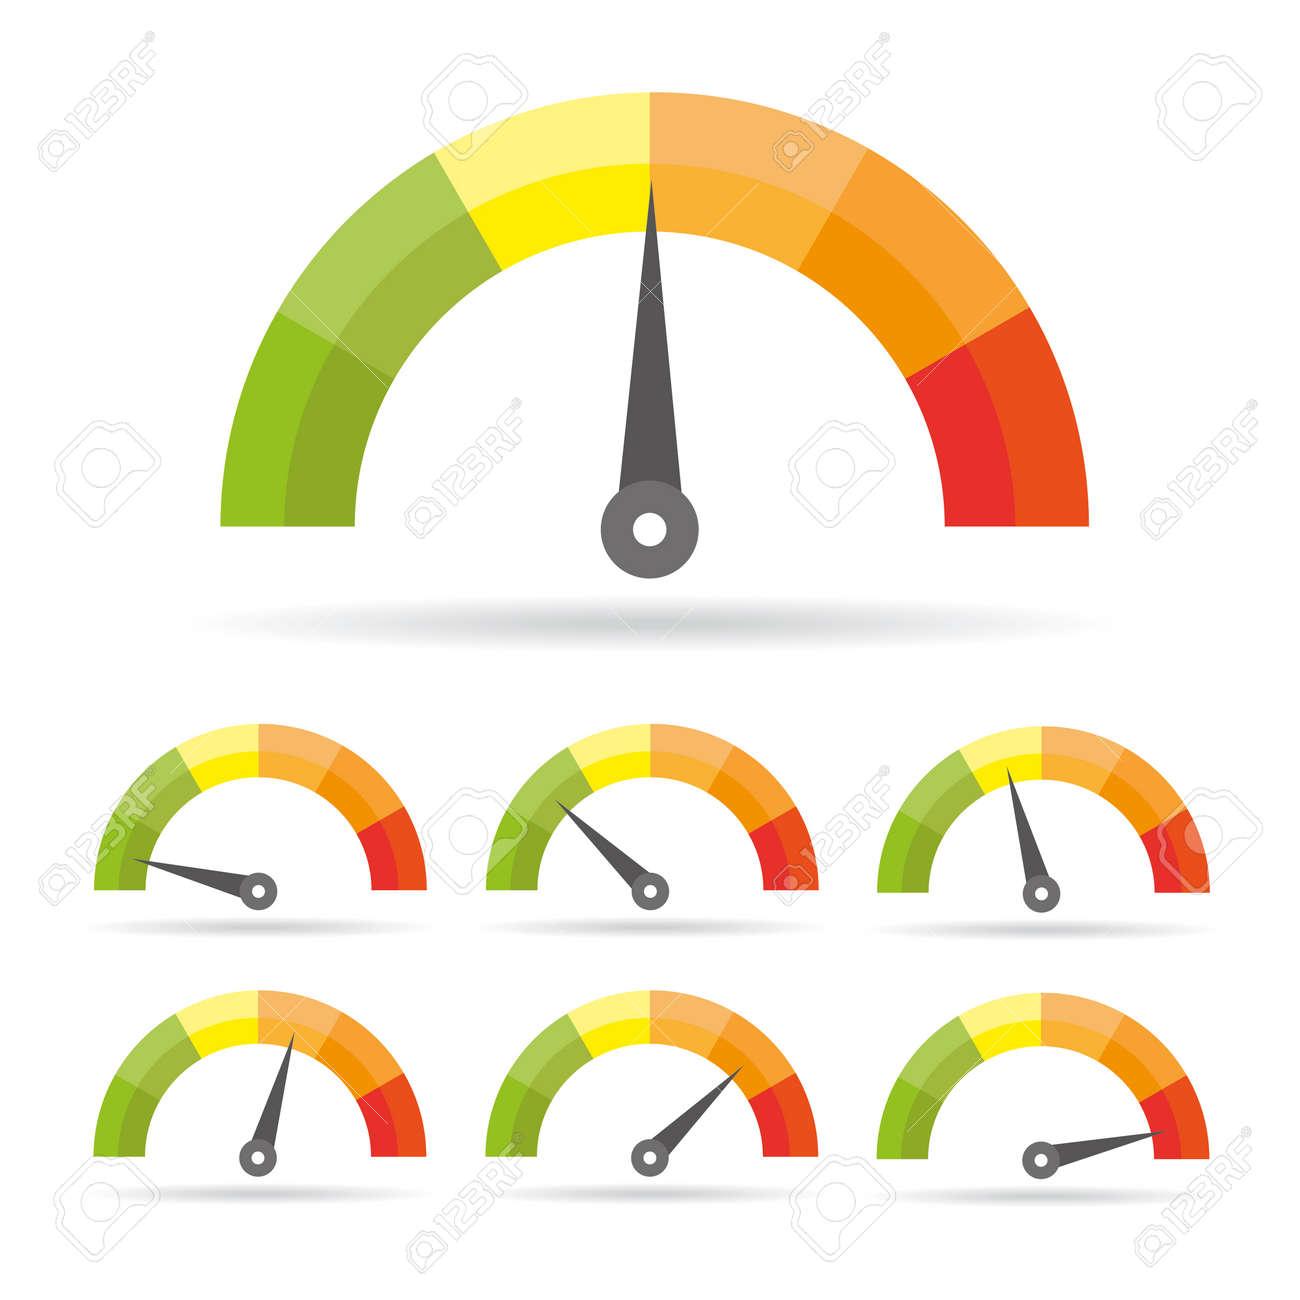 Speedometer icon. Colorful Info-graphic - 81148173